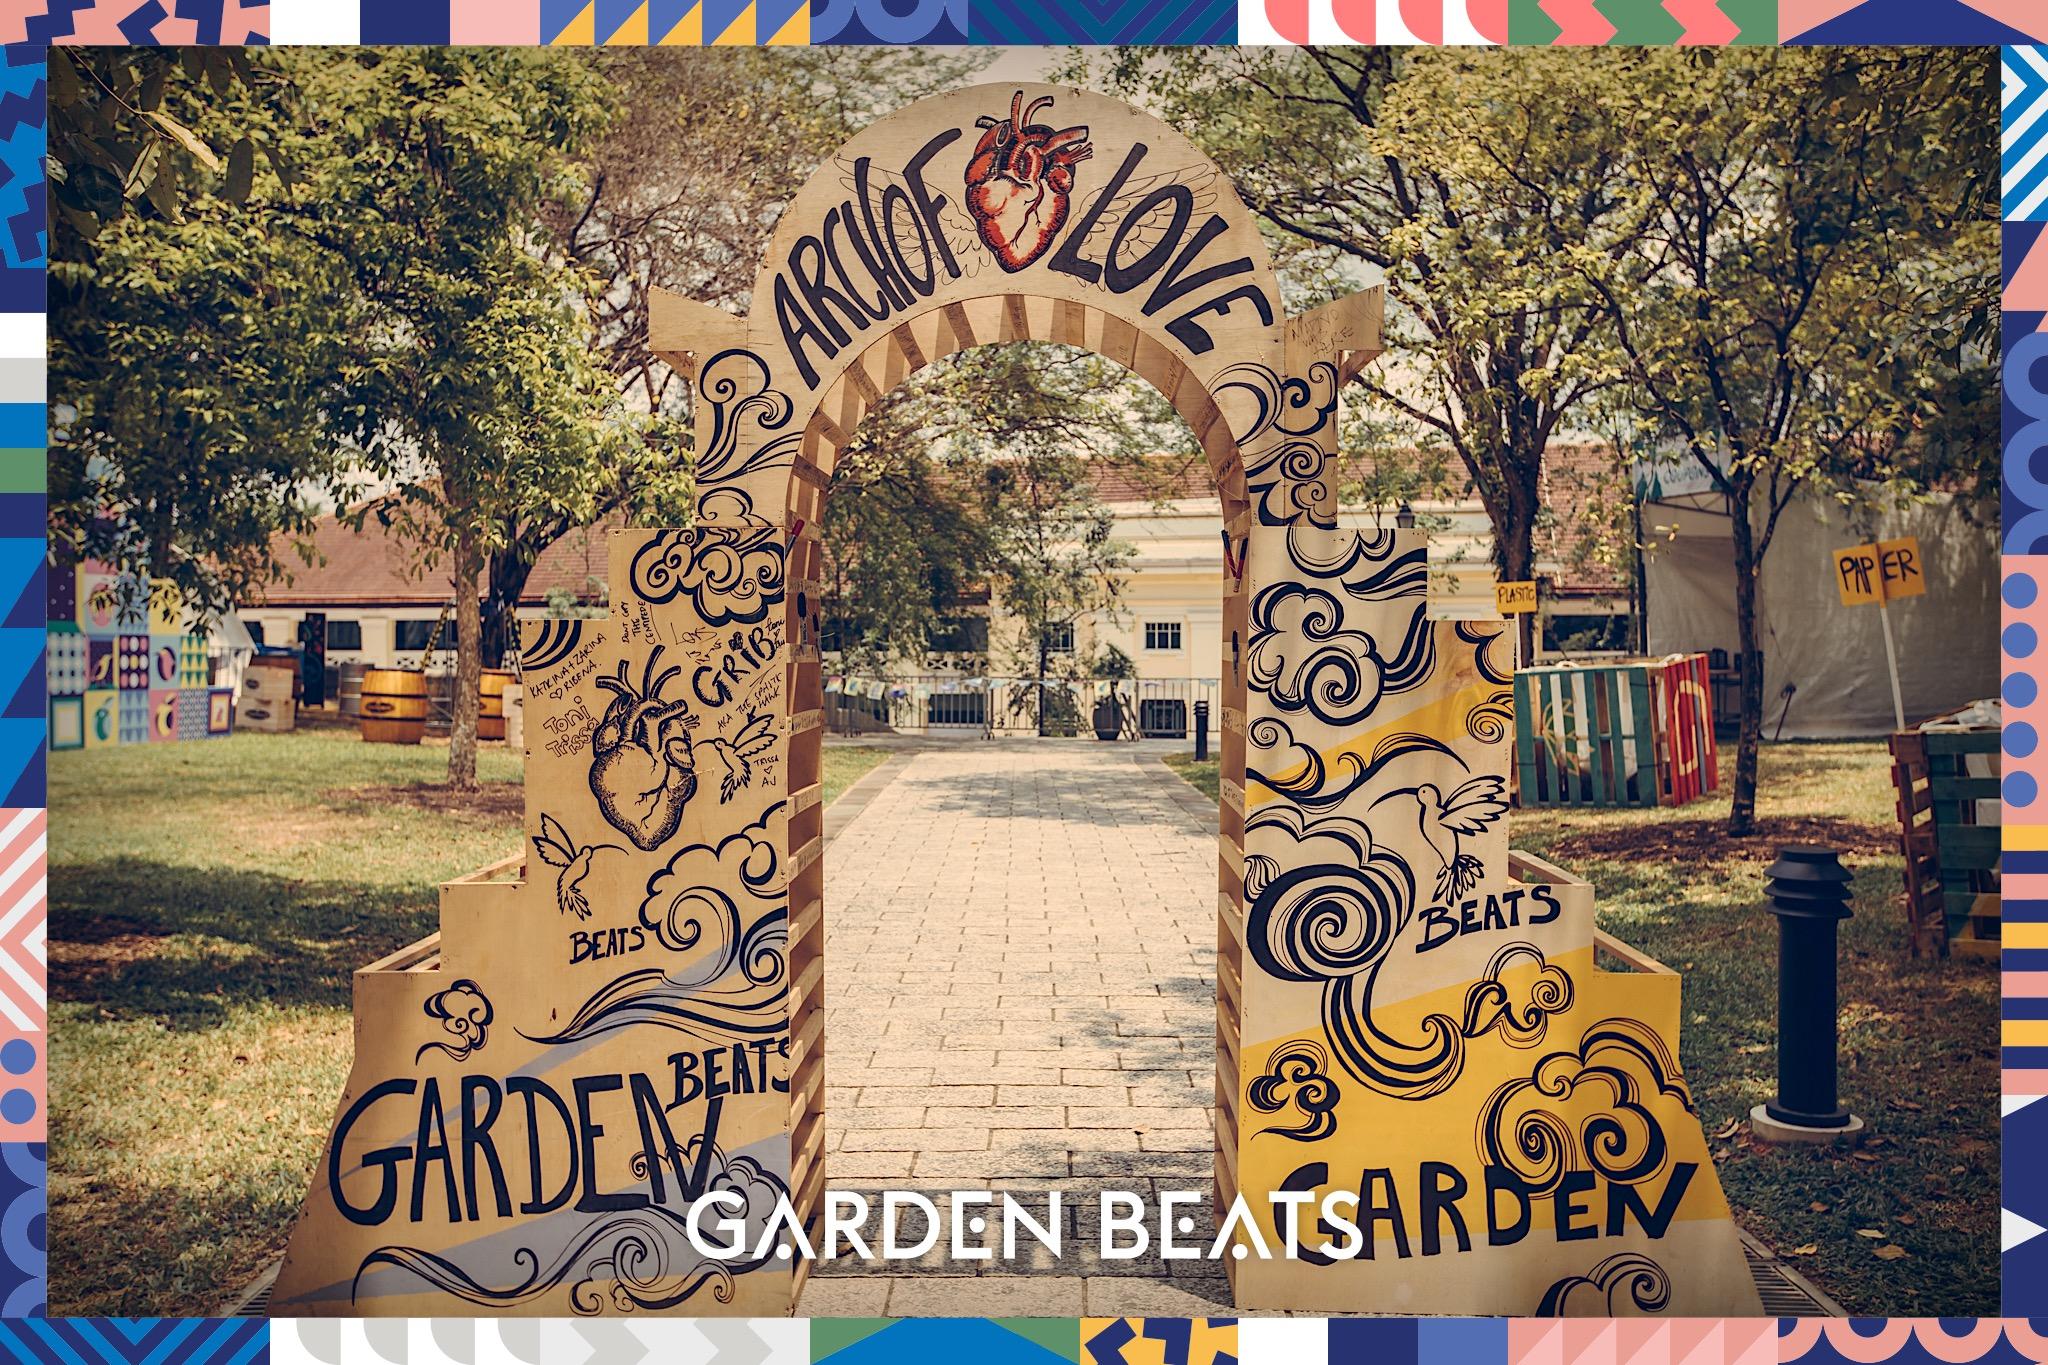 03032018_GardenBeats_Colossal035_Watermarked.jpg